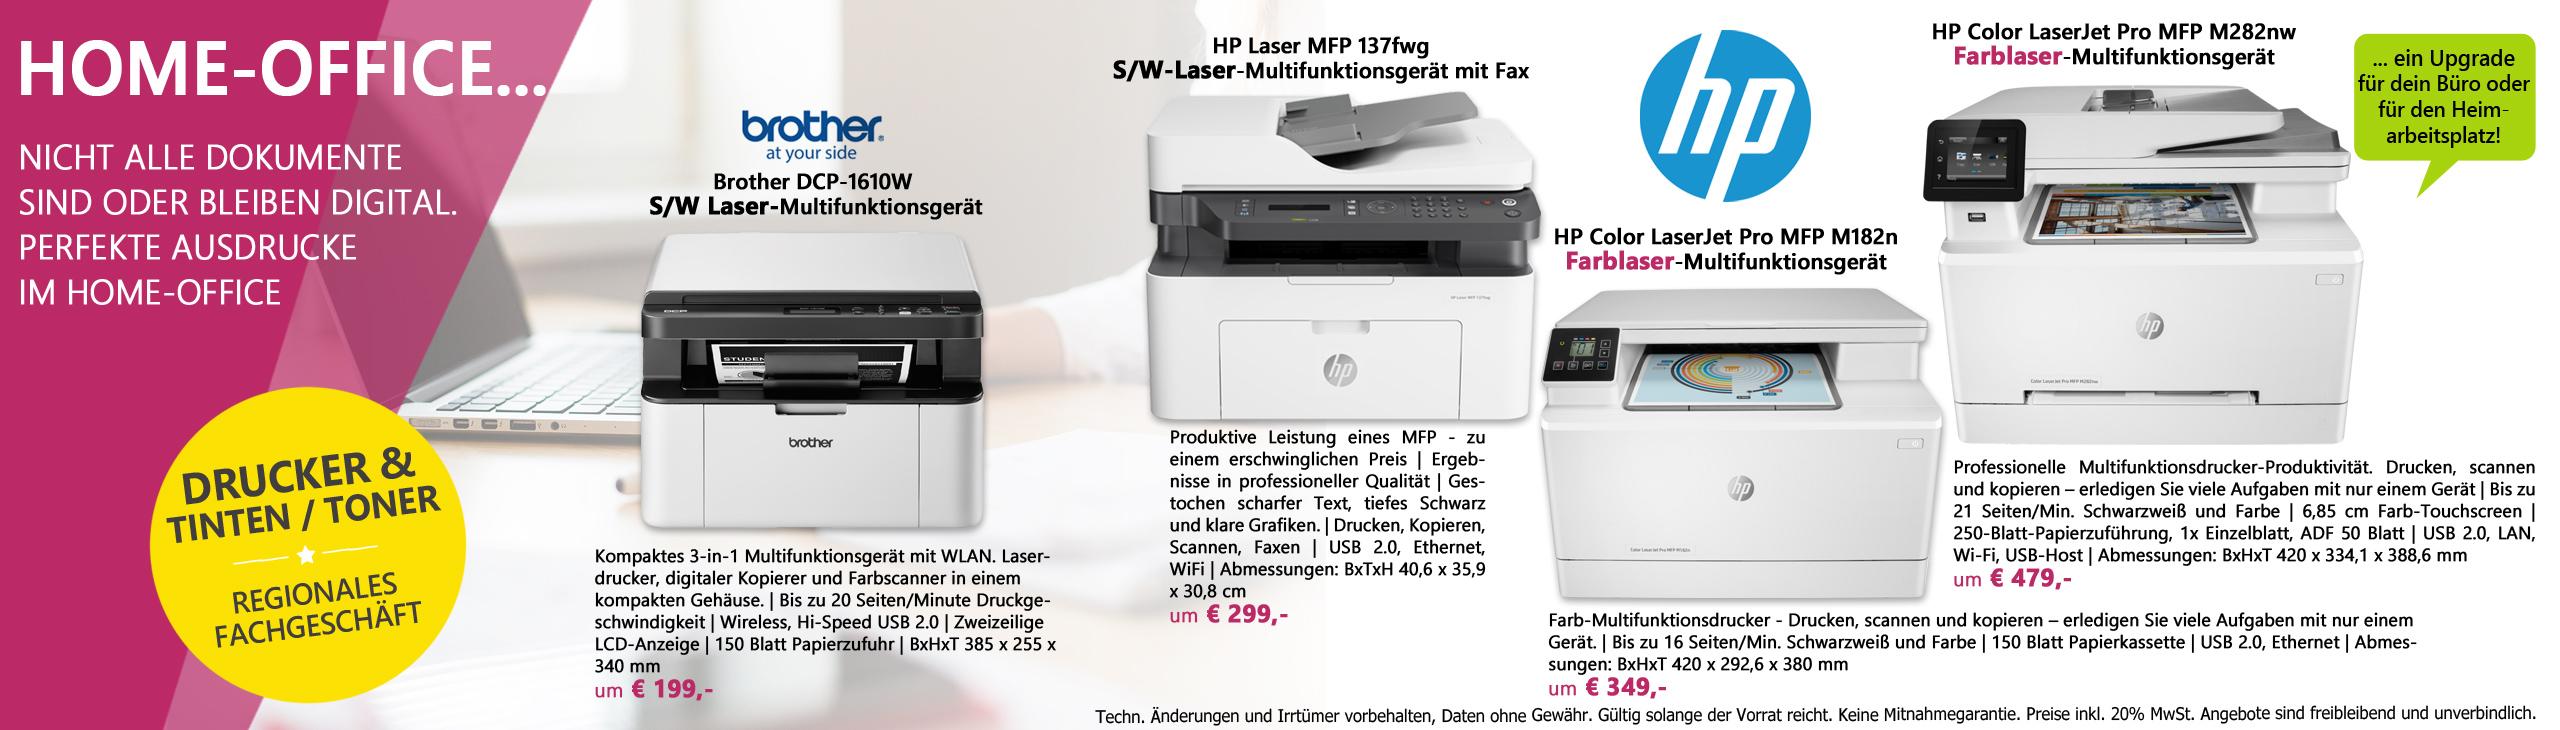 Banner homeoffice laserdrucker 052021